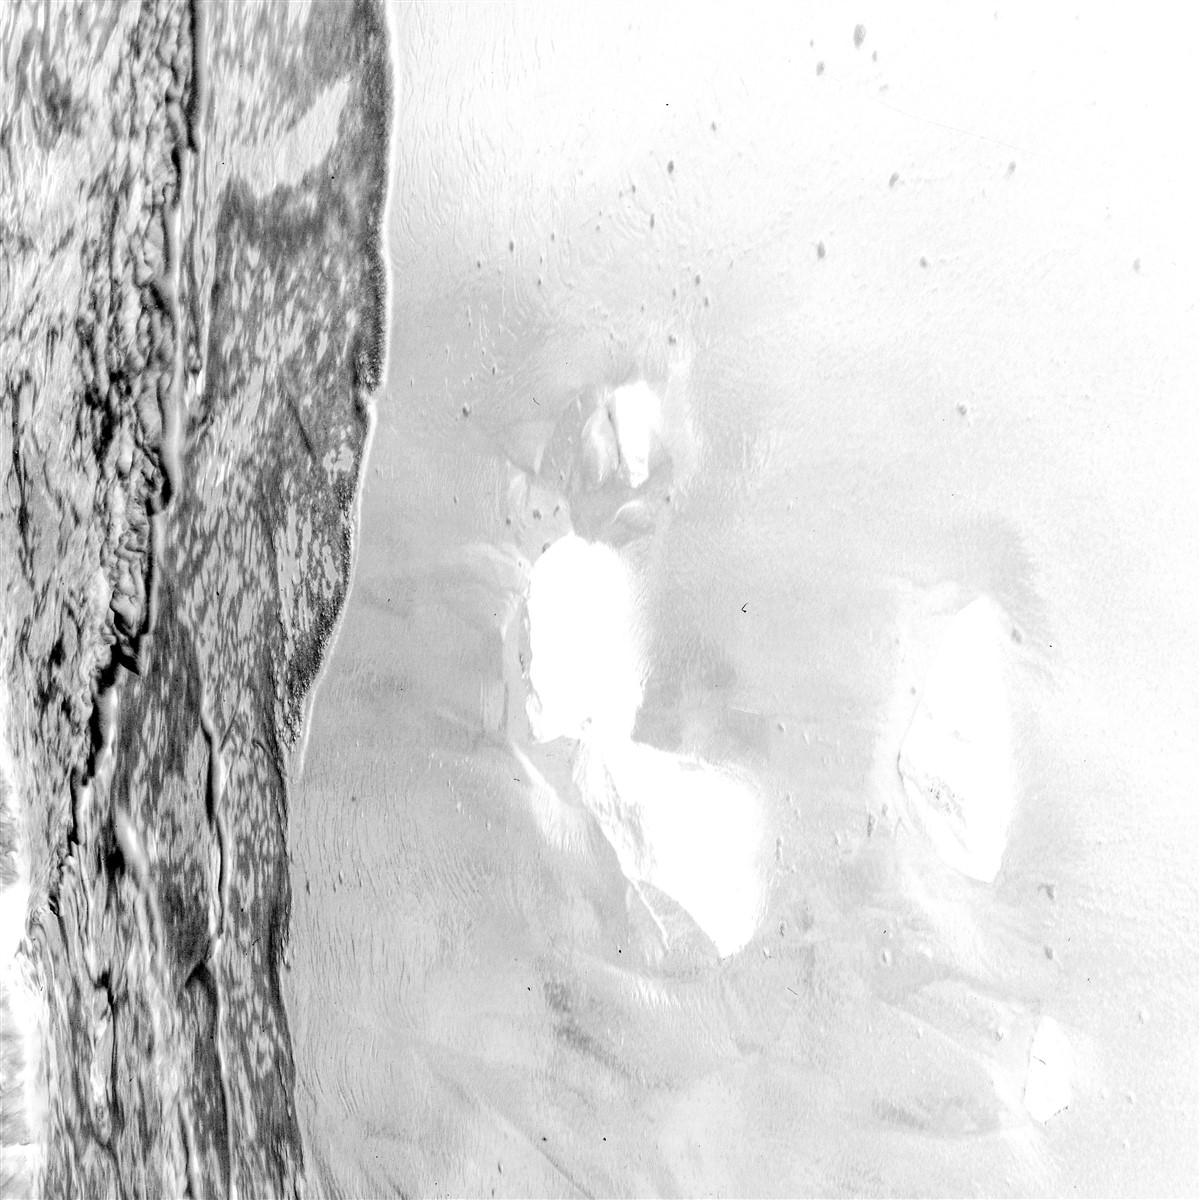 Riccardo Squillantini, Meteor Passage, Martian Age series